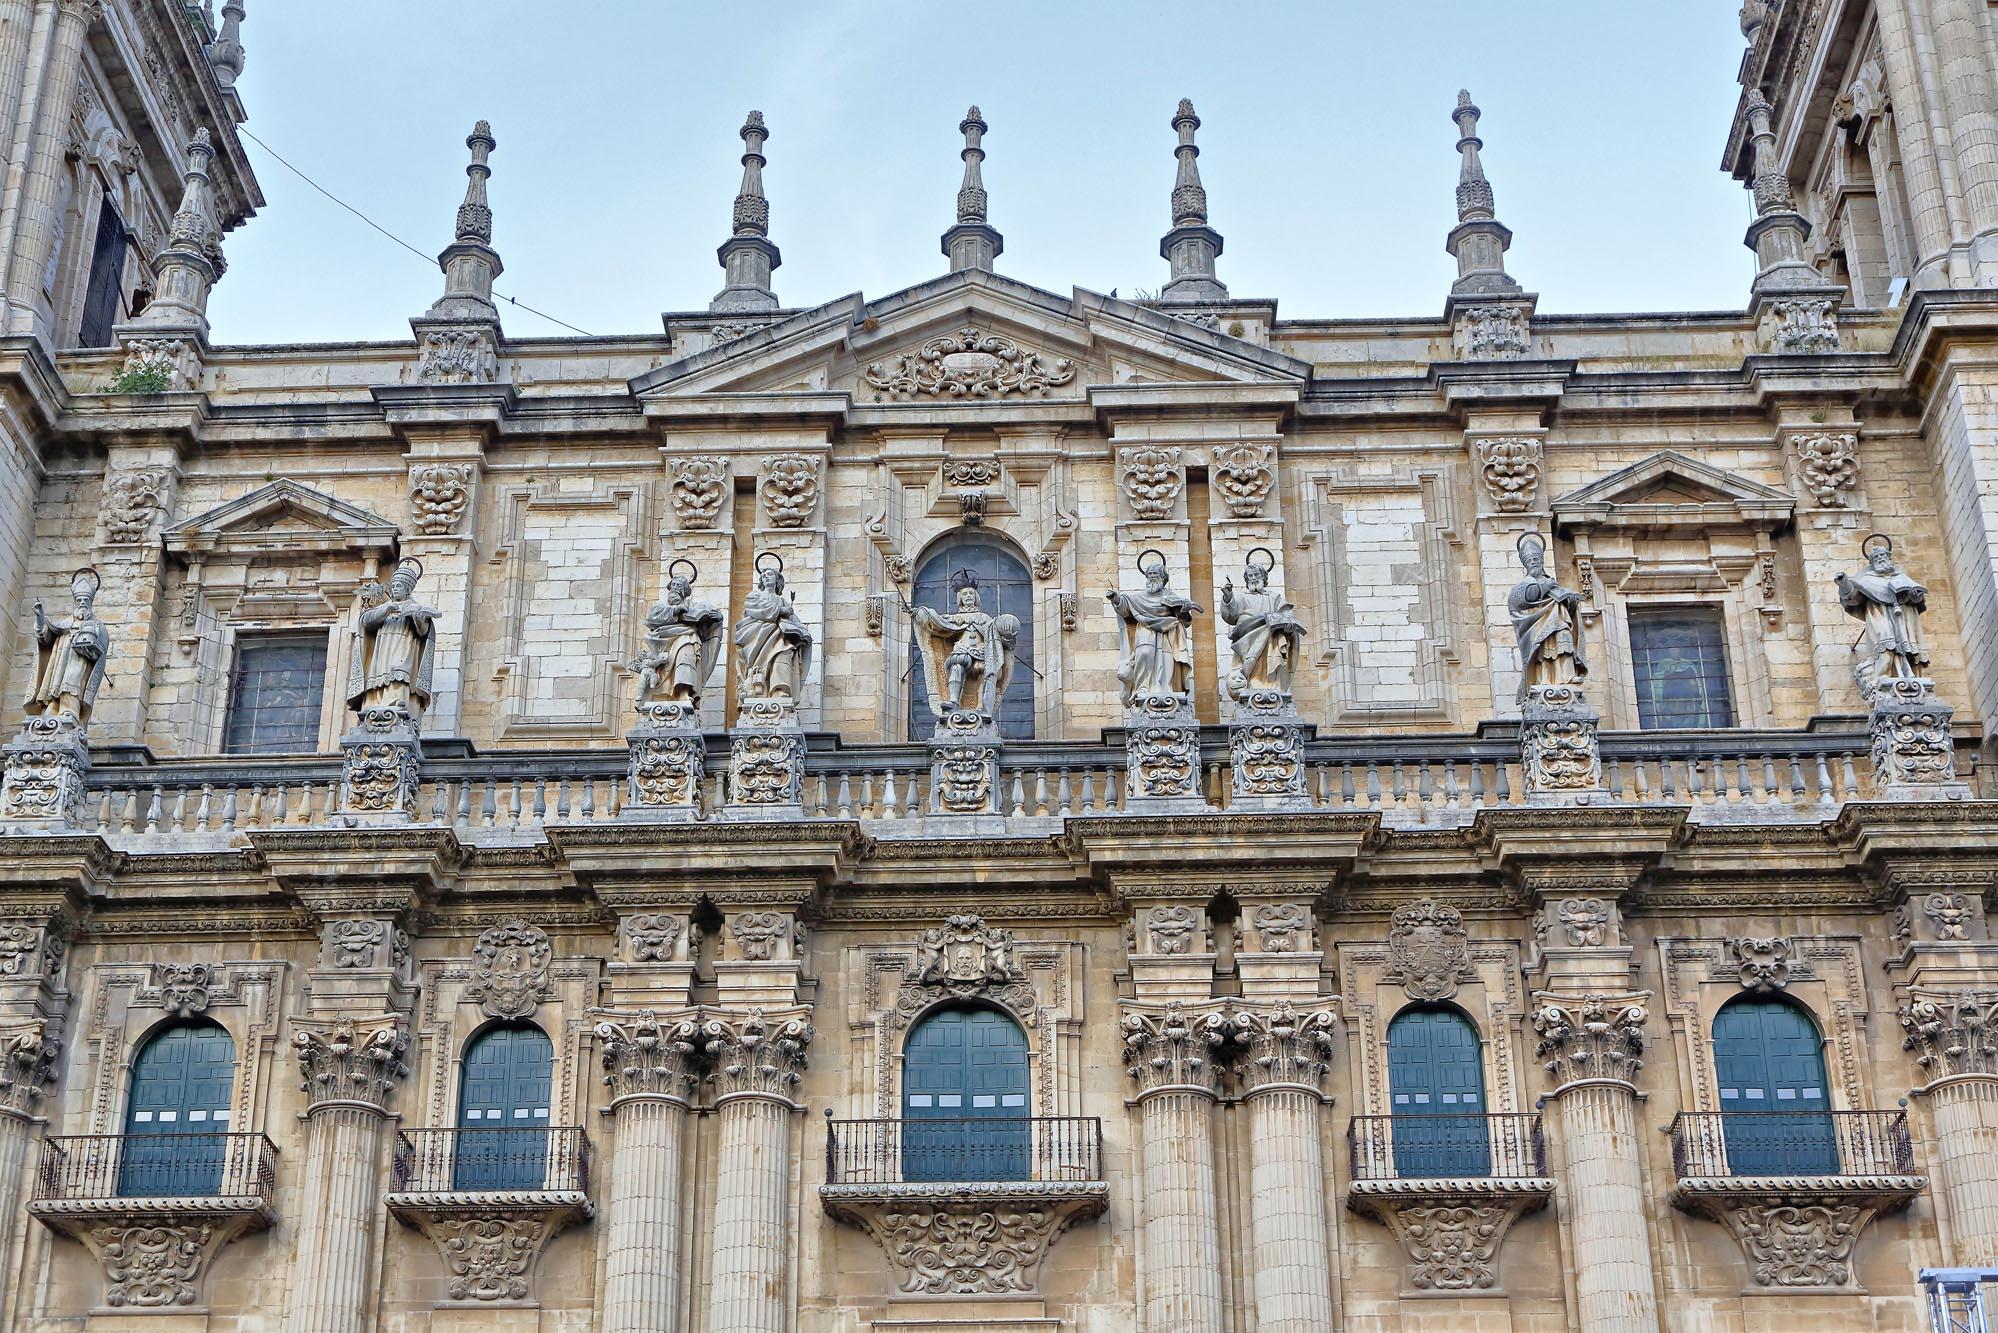 La catedral de Jaén sirvió de inspiración a otras catedrales que se levantaron en países como México, Perú o Colombia.